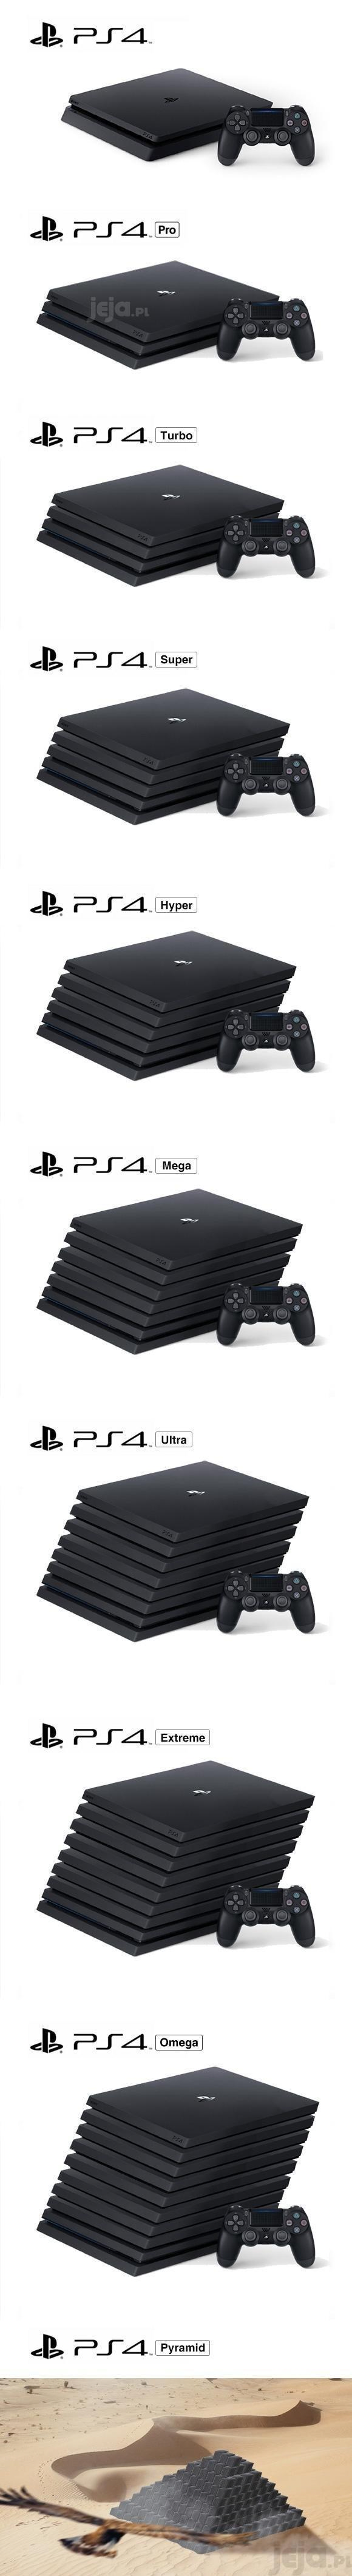 Nowe PlayStation